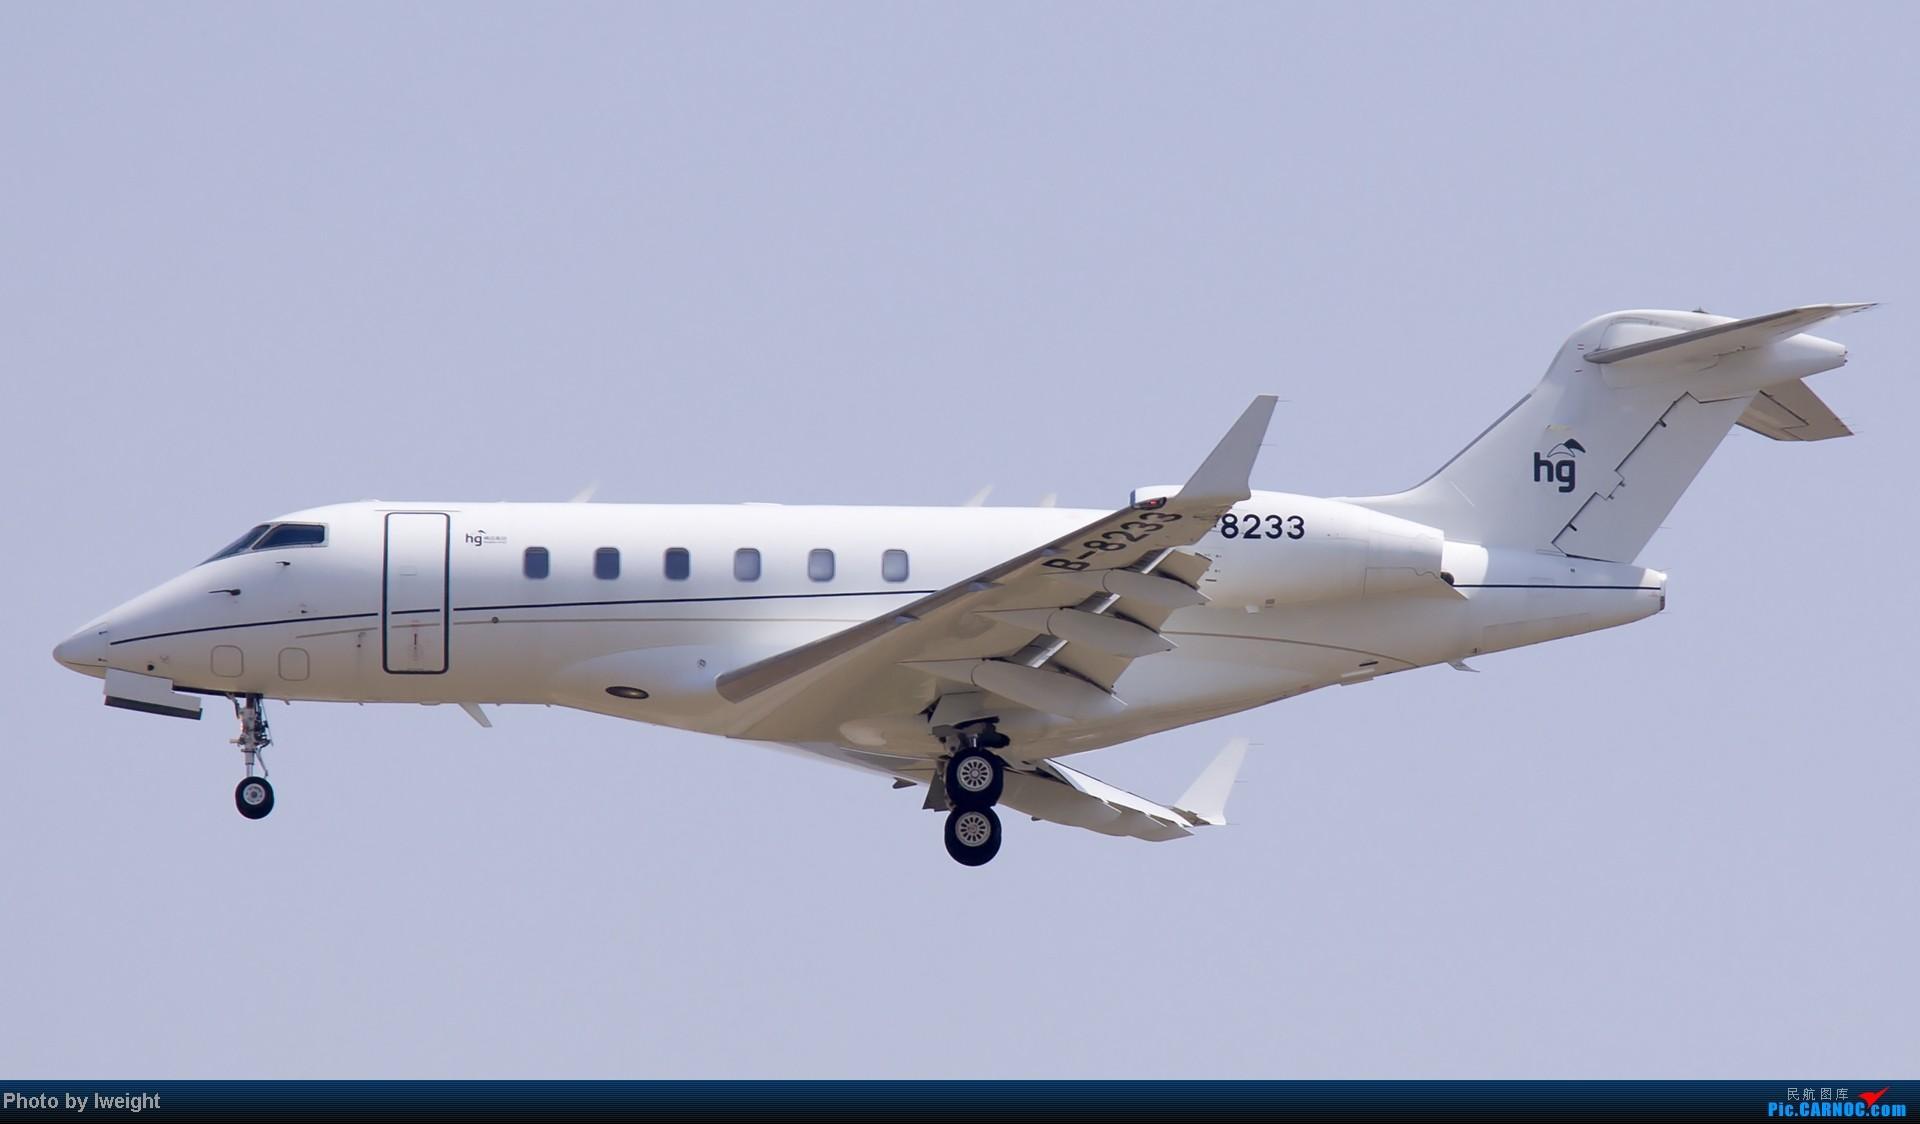 Re:[原创]错过了卡航的巴塞罗那号,只有这些大路货了,泪奔啊 BOMBARDIER BD-100 B-8233 中国北京首都机场